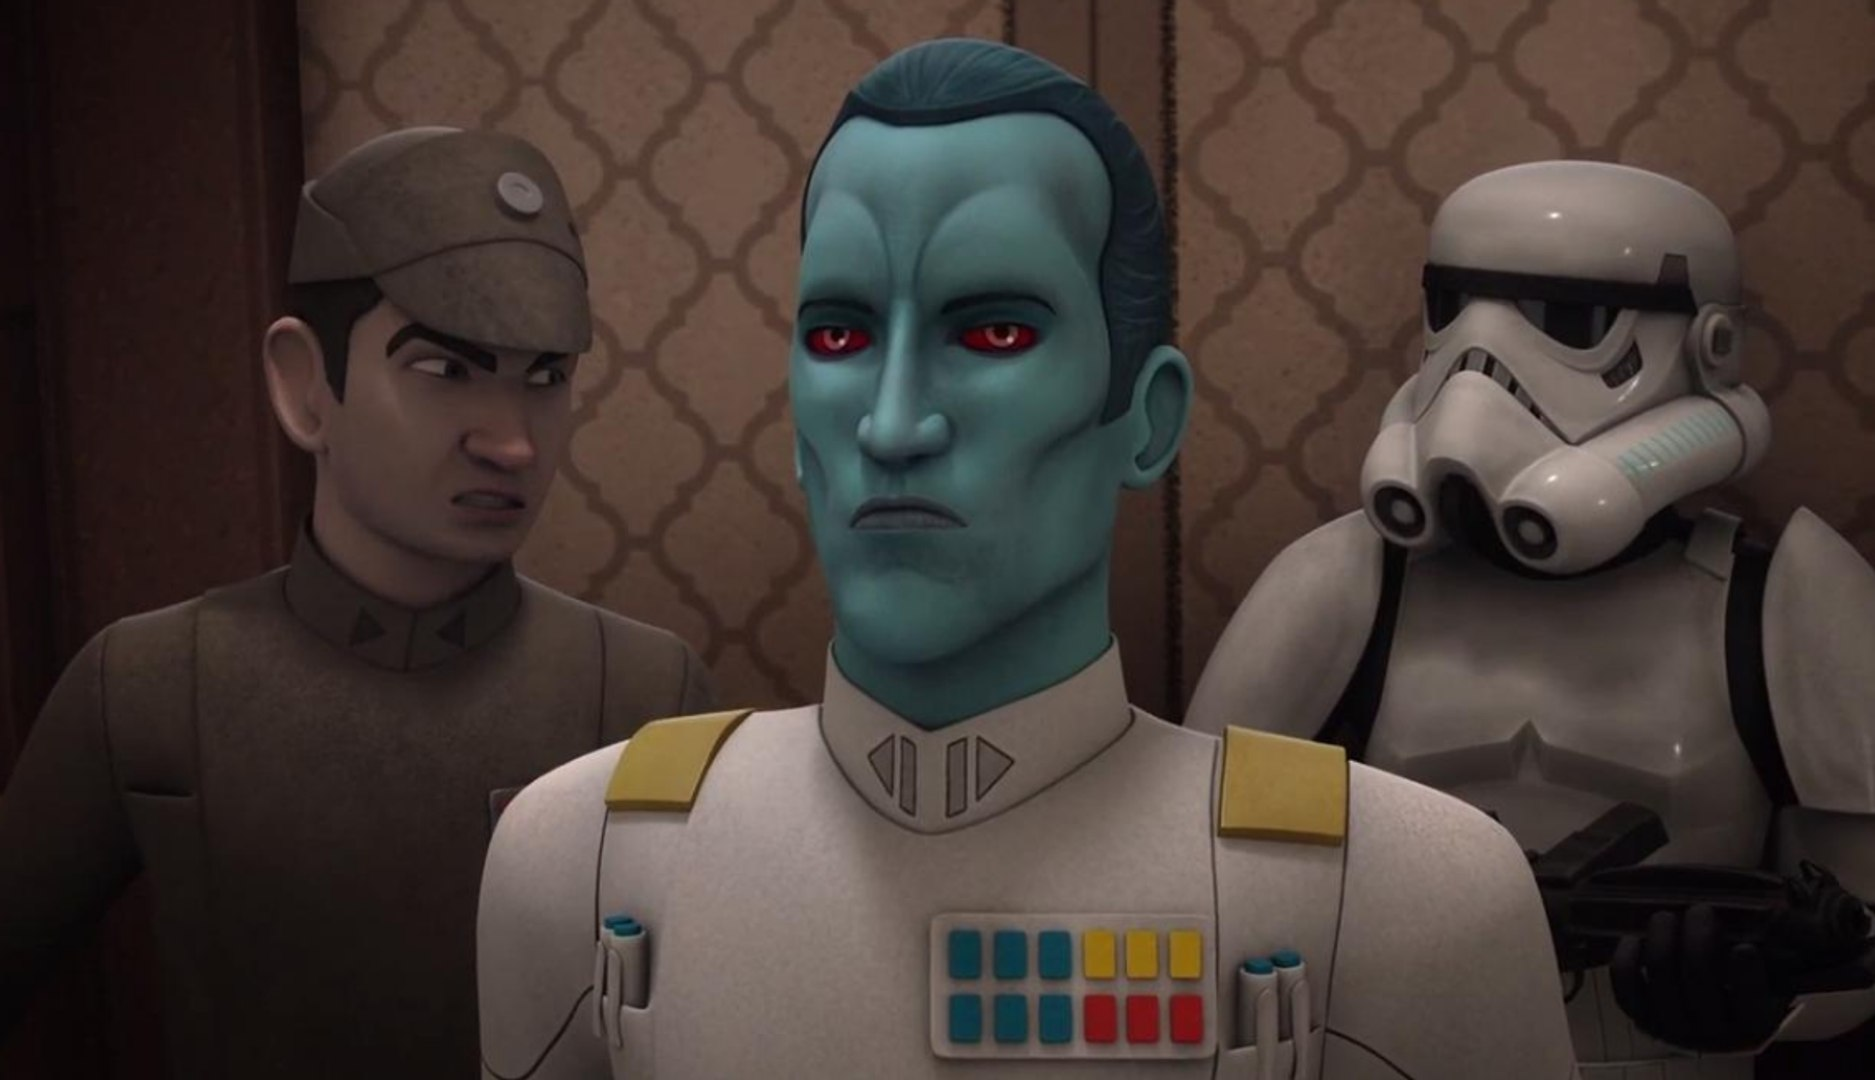 Star Wars Rebels Season 3 Episode 9 full show Star Wars Rebels Season 3 Episode 9 full episodes Star